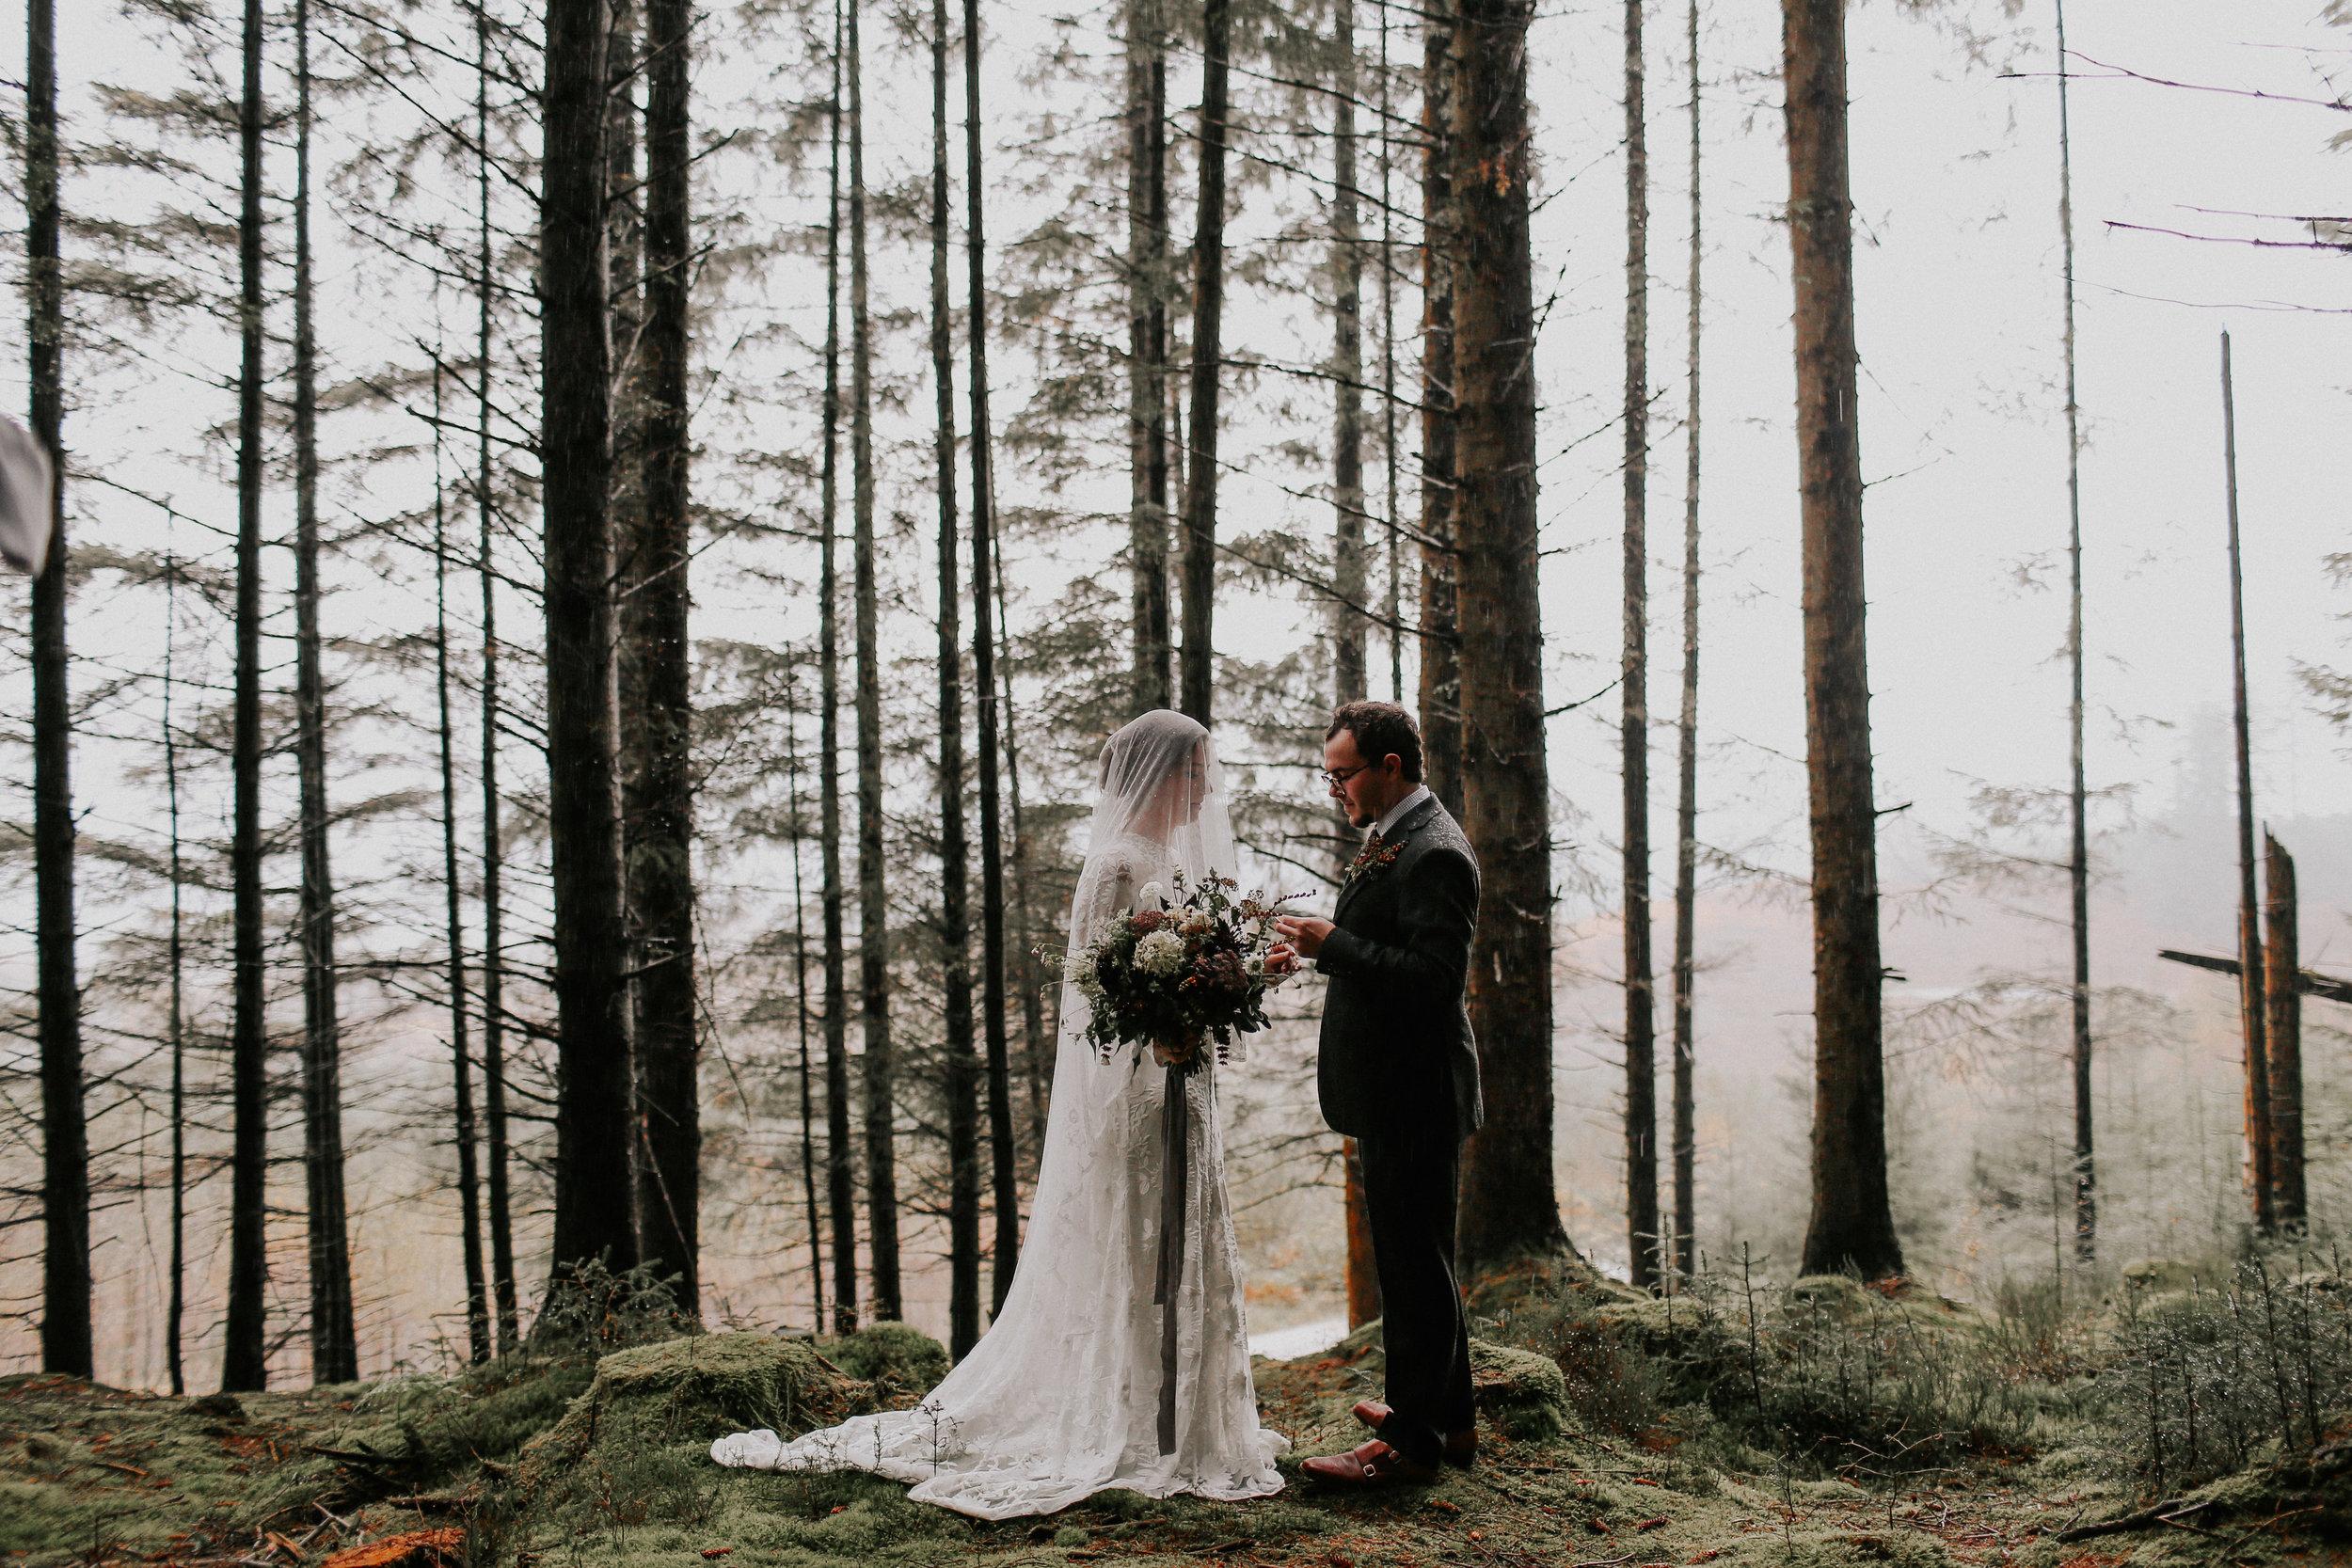 Scotland_Elopement_Melissa_Marshall_Photography_34.jpg